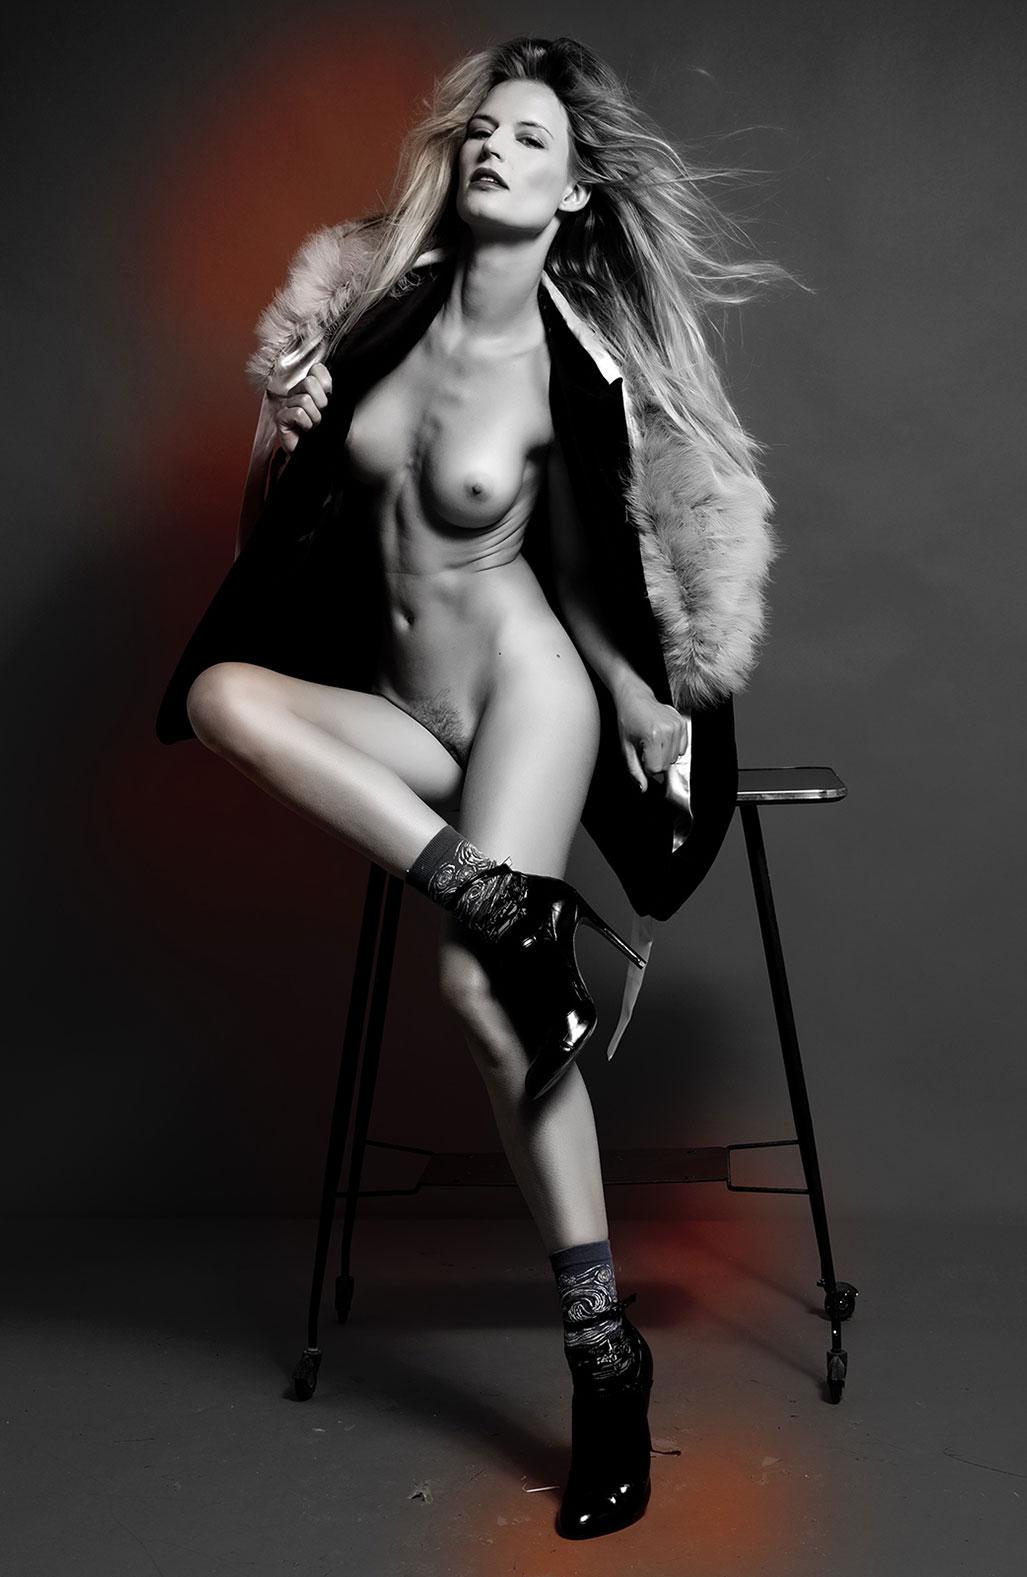 Cynthia Cremer - Paolo Prisco photoshoot